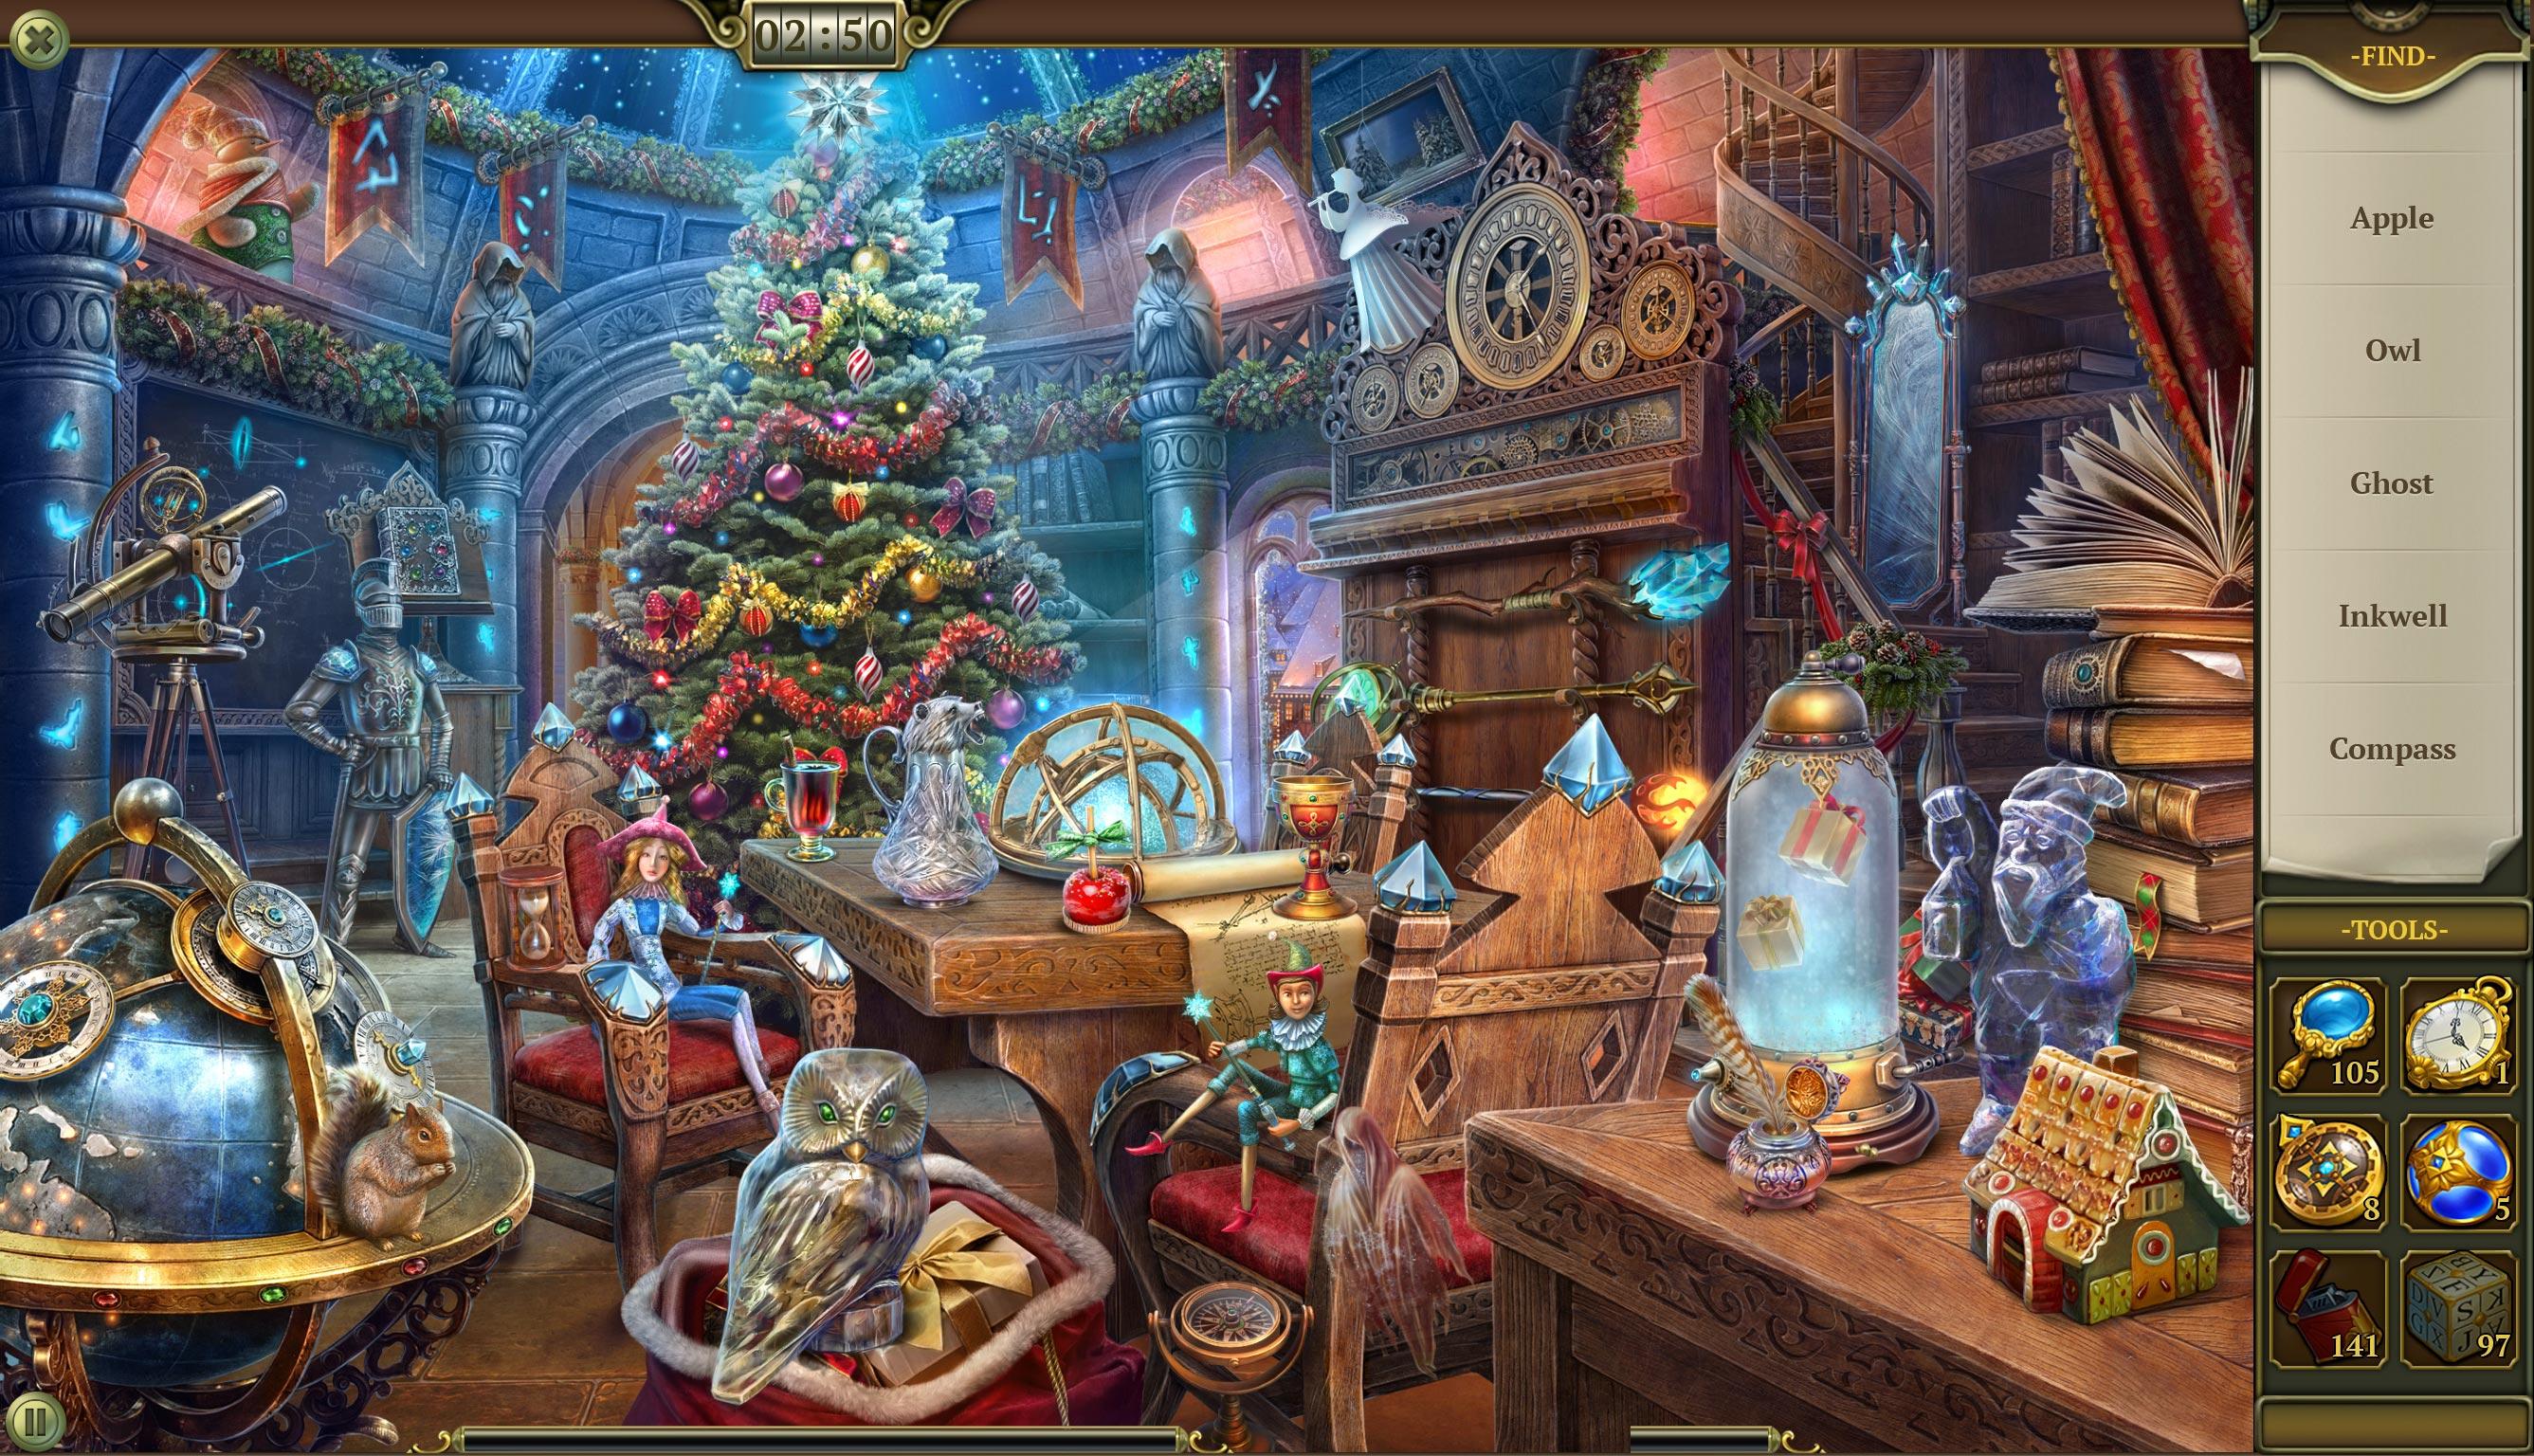 HiddenCity introduction イントロダクション クリスマスの学校